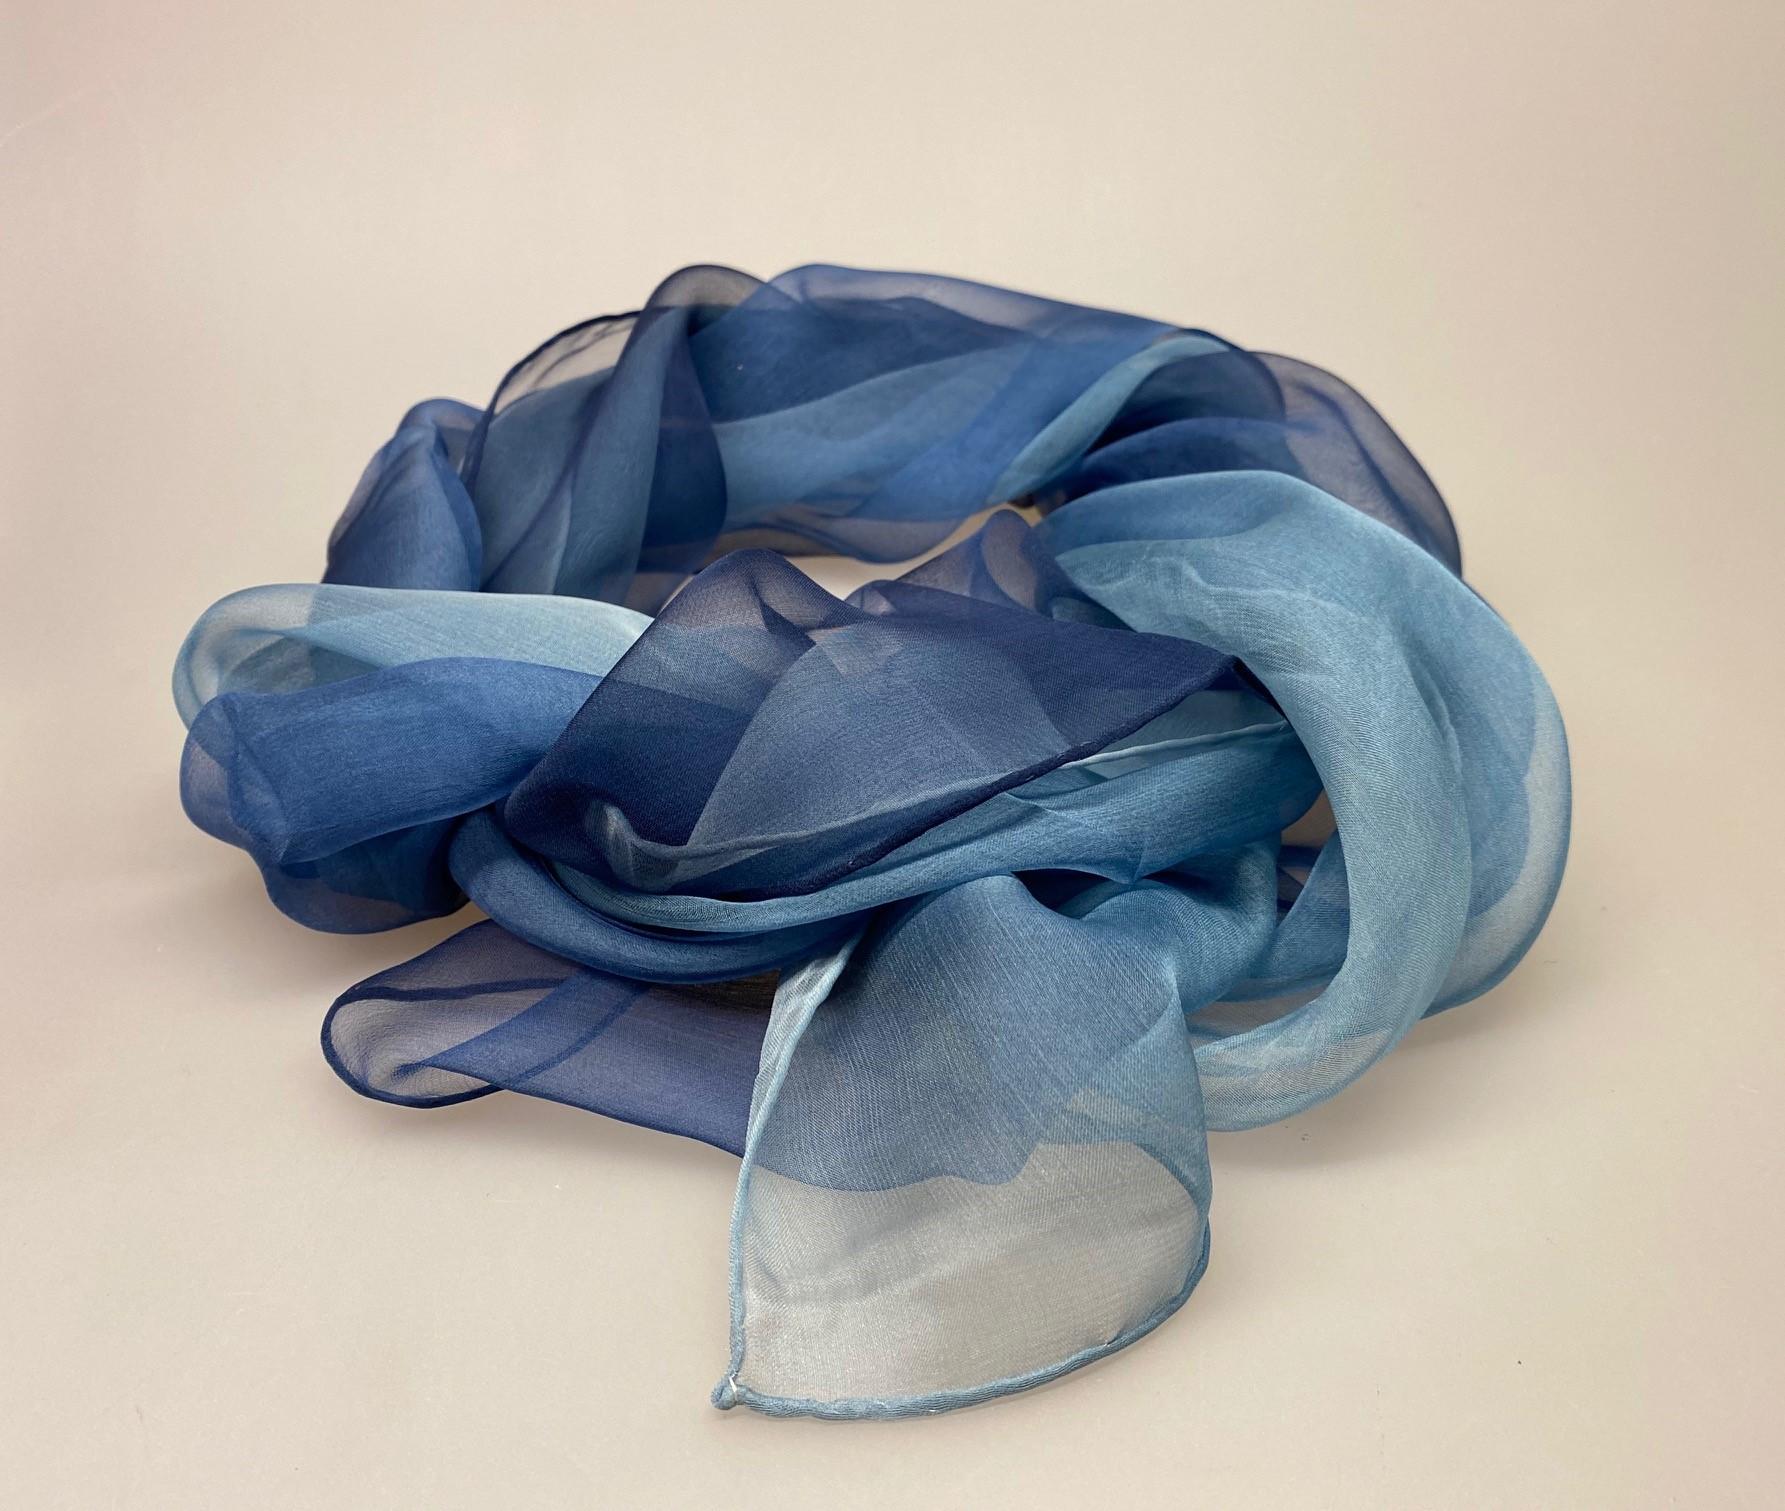 1158-044, Silkechiffon Tørklæde 1158 - Marineblå/lyseblå , jeansblå, denimblå, gråblå, mørkeblå, navyblå, marine blå, blå farver, tyndt, stort, lækkert, luksuriøst, flot, eksklusivt, stola, sjal, tørklæde, silketørklæde, ren silke, silkesjal, silkestola, biti, ribe